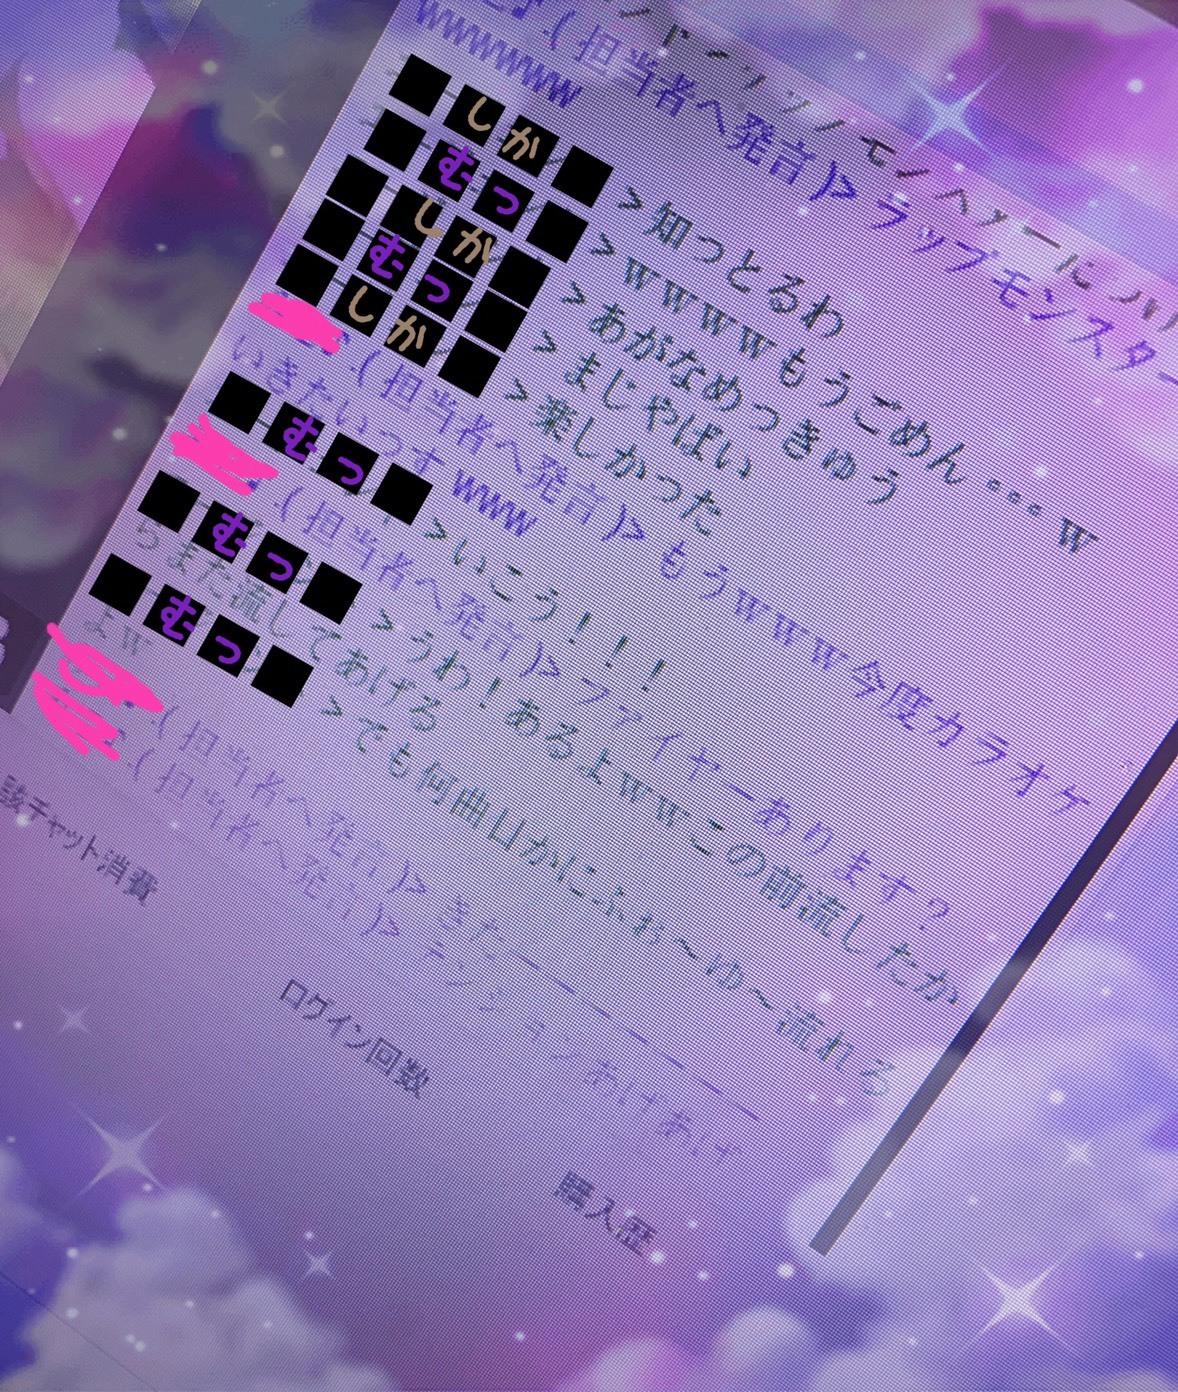 S__3416140.jpg